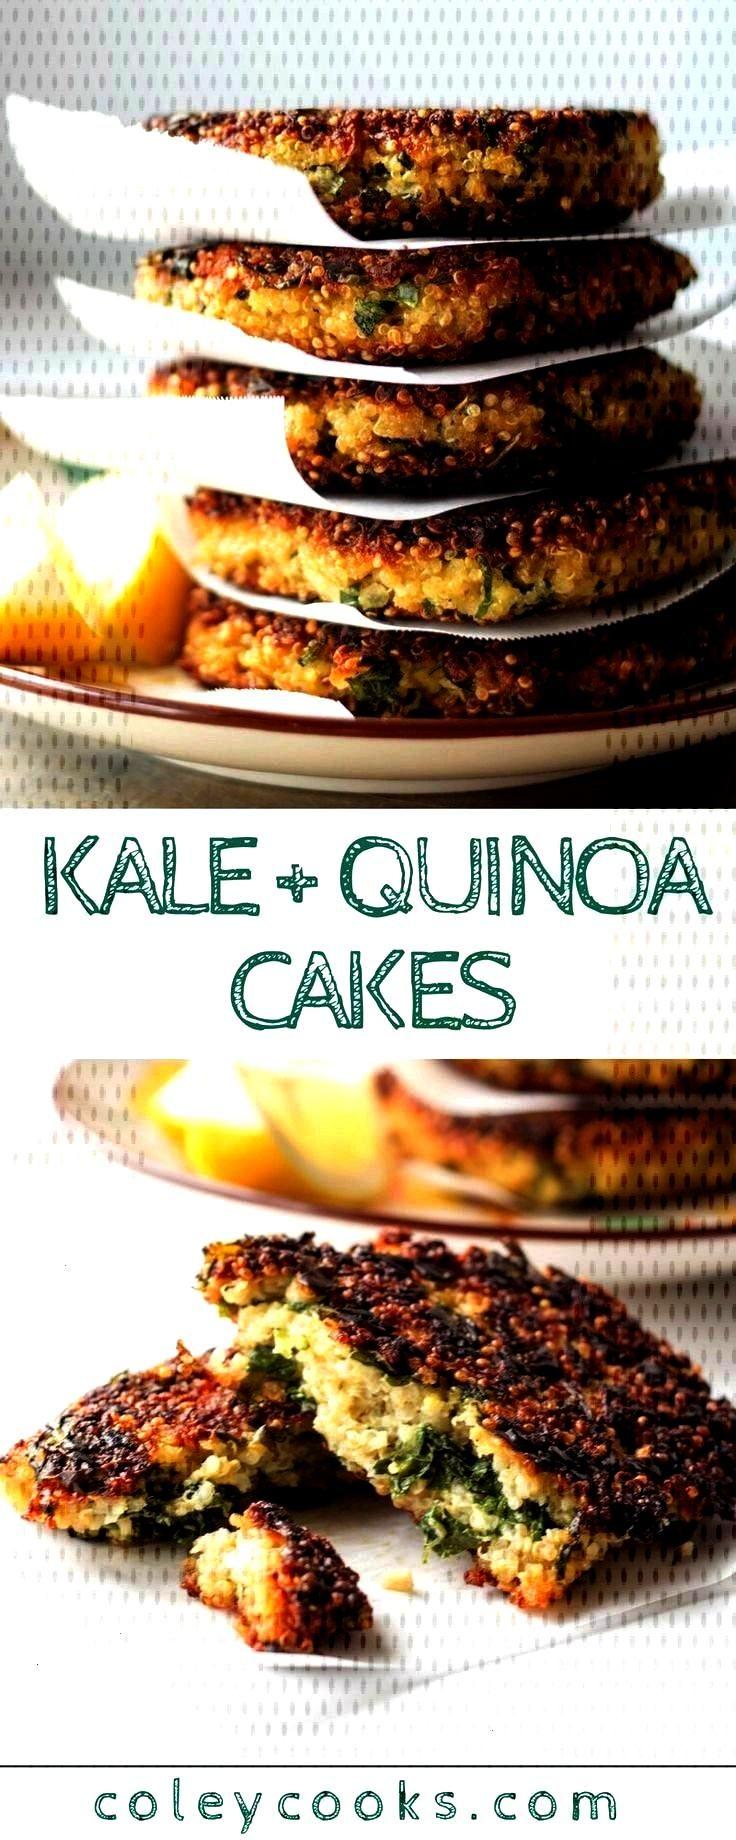 Quinoa Cakes (Video!) | Coley Cooks... KALE + QUINOA CAKES | This easy vegetarian recipe is high in